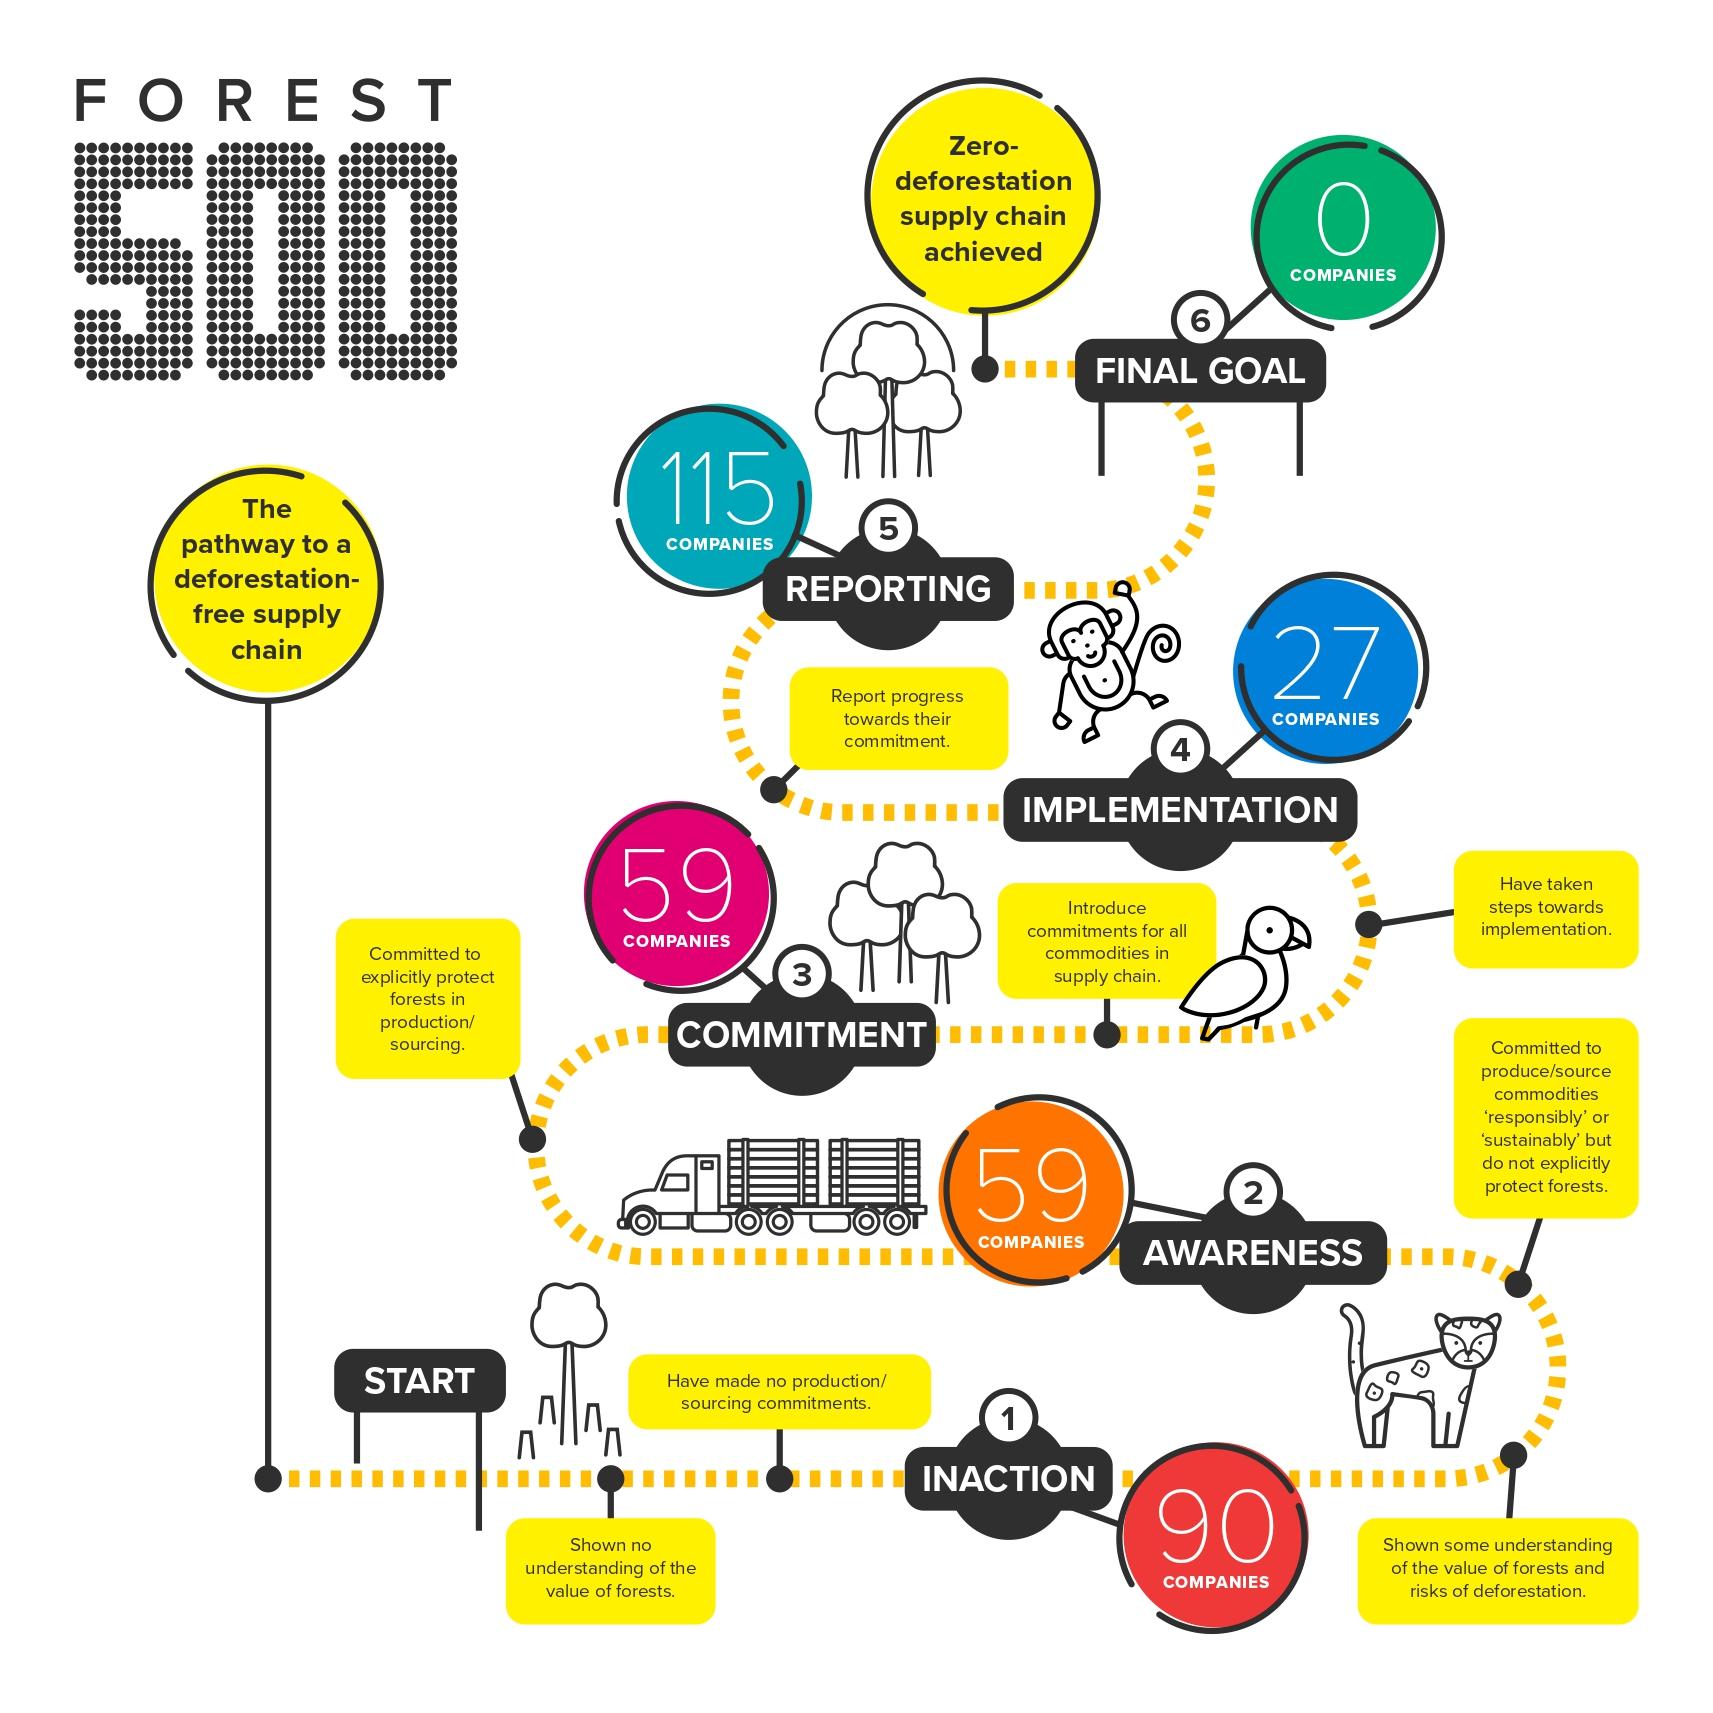 More Evidence Companies Won't Meet 2020 Deforestation Targets